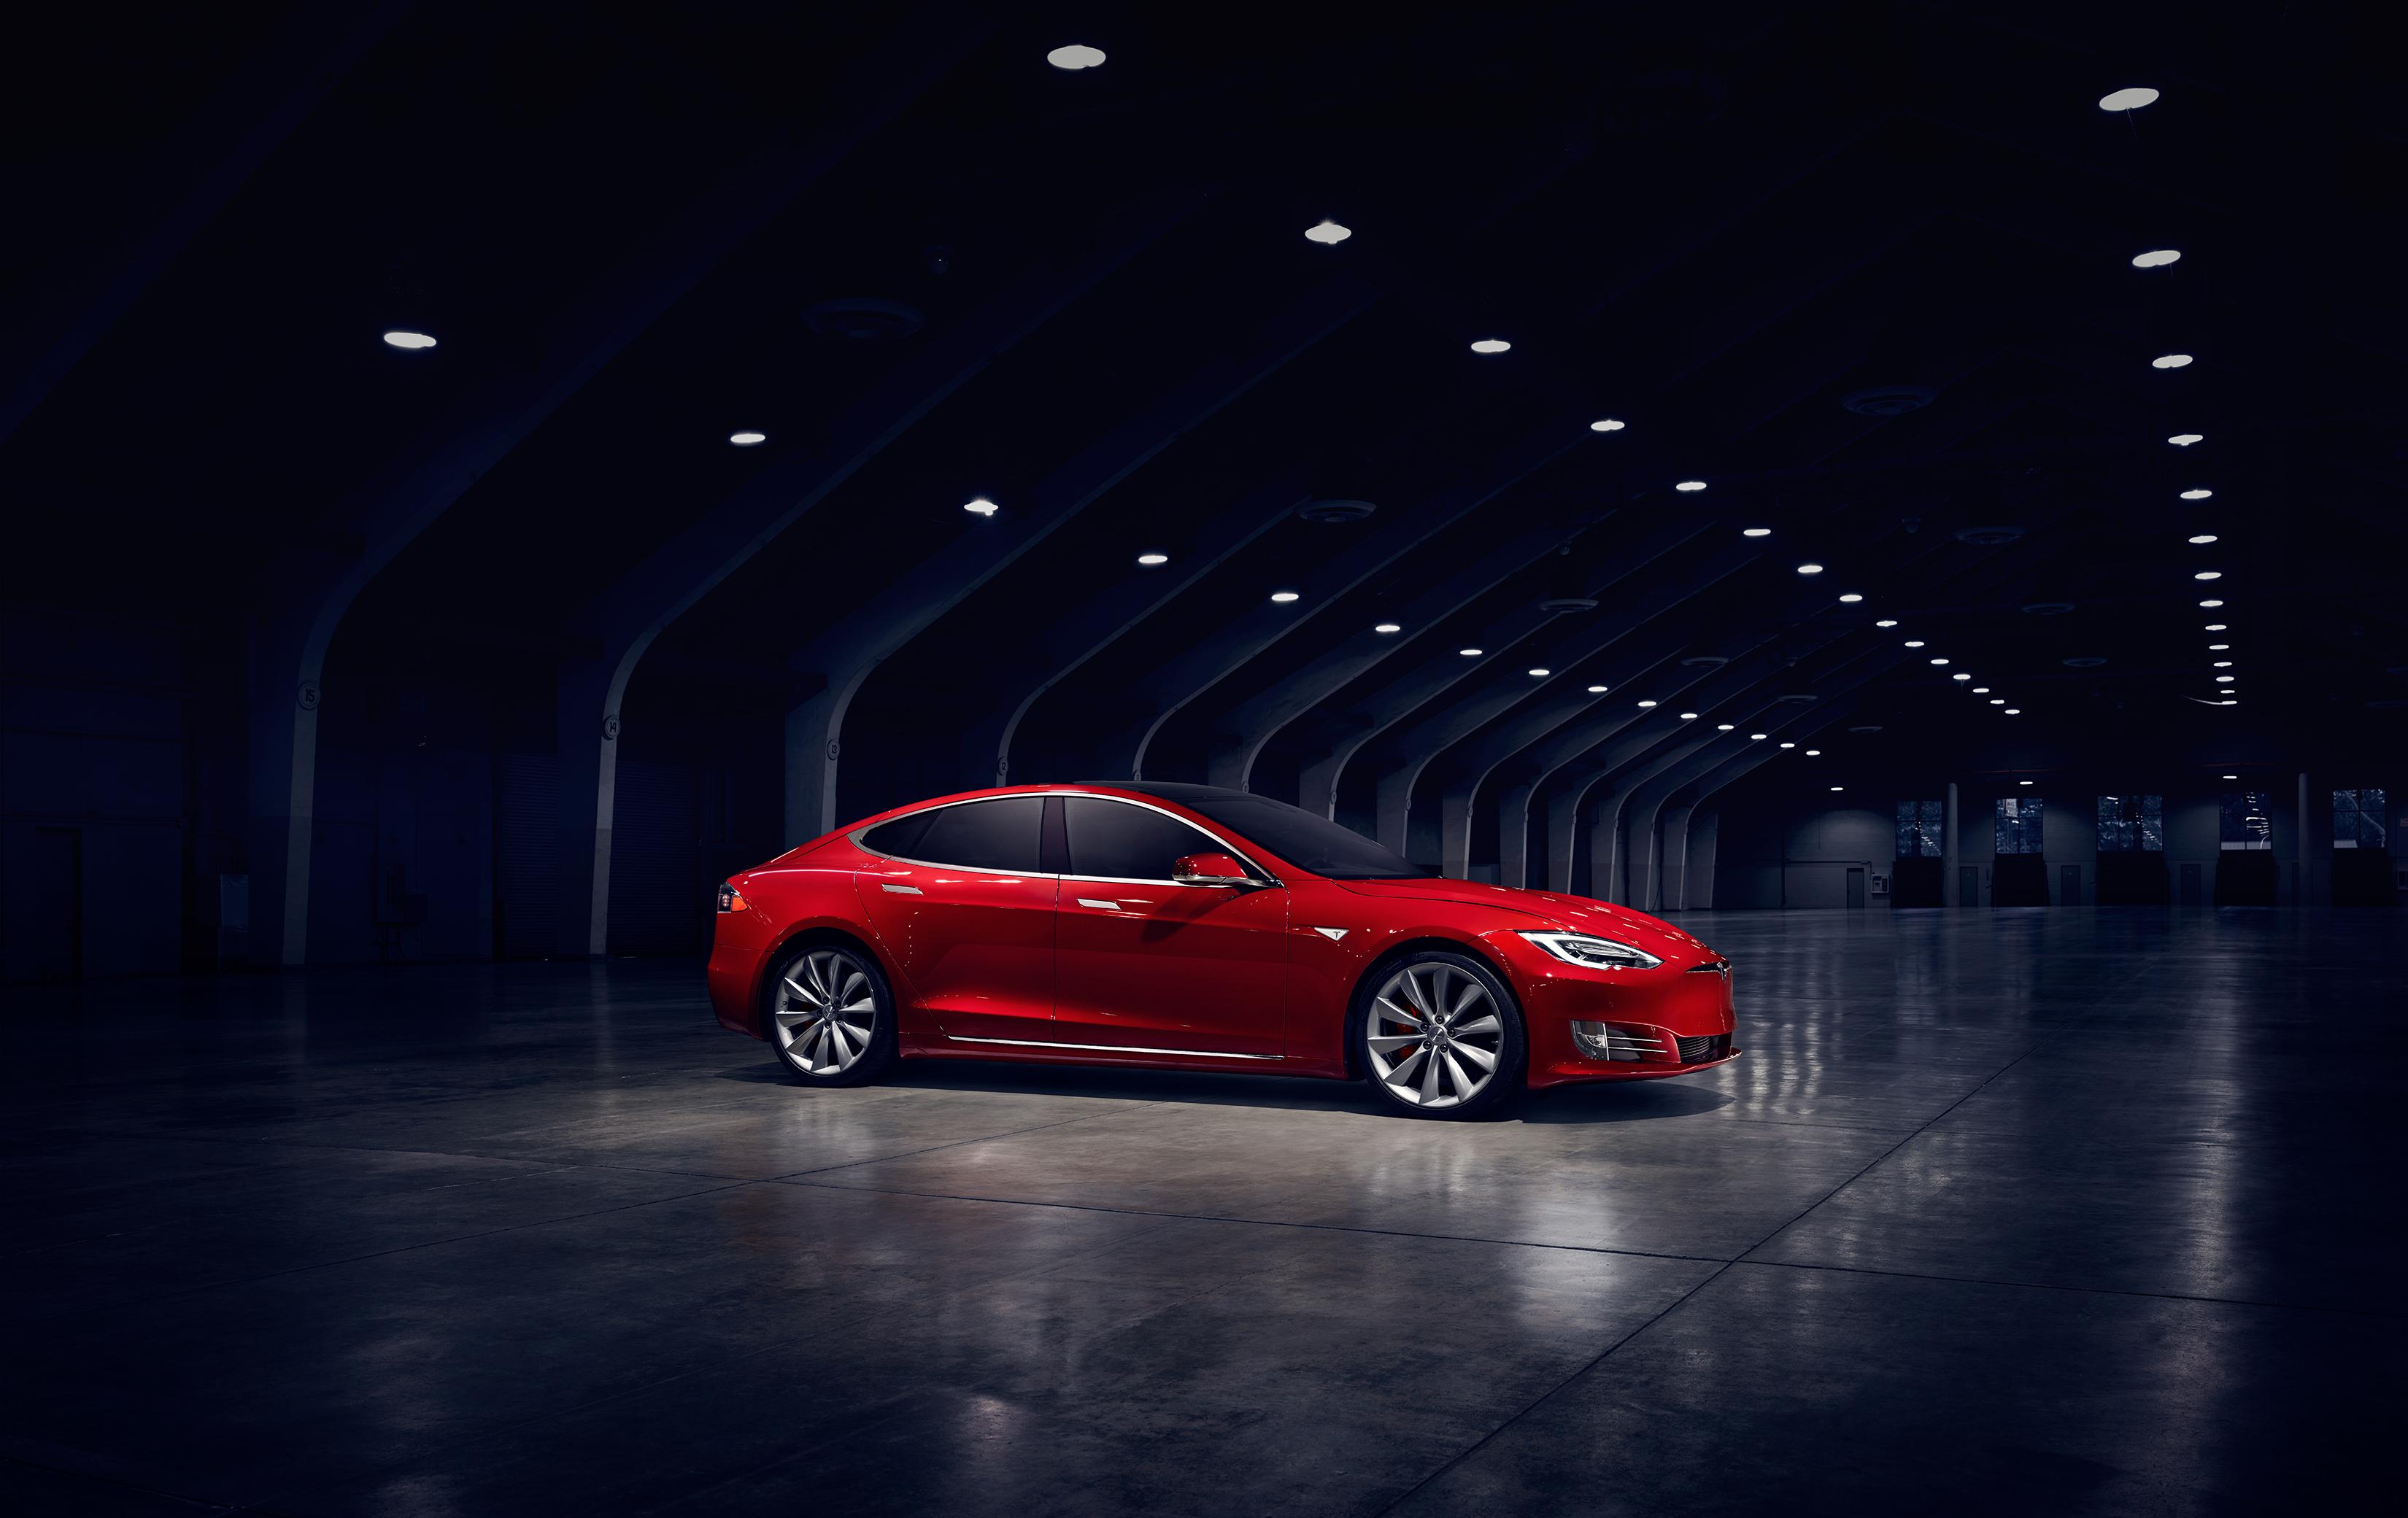 Tesla Model S zevenzitter